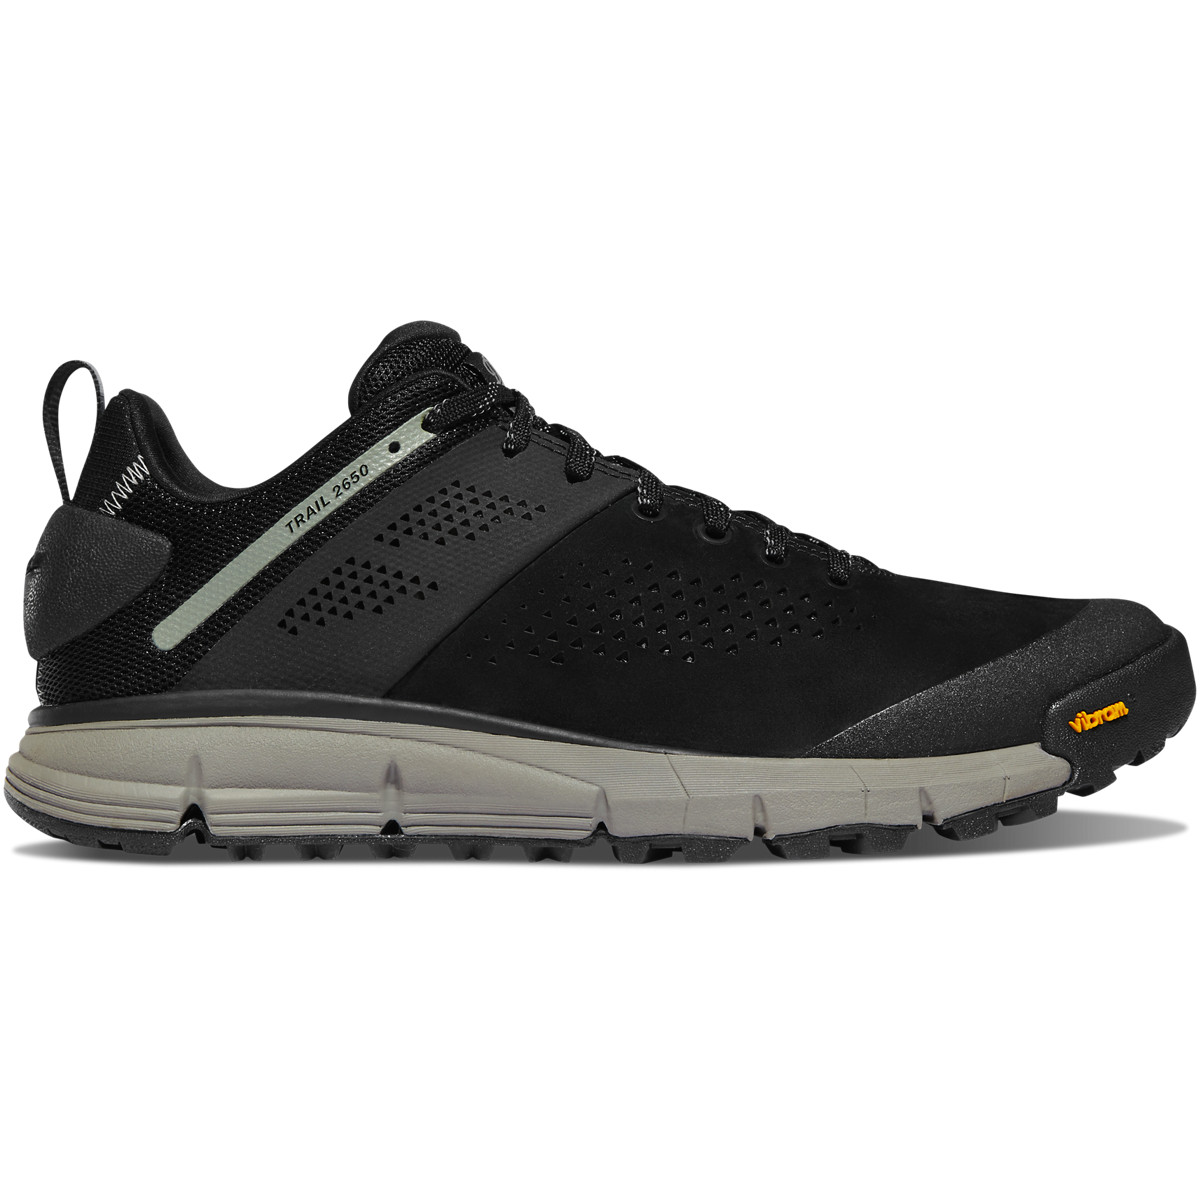 Trail 2650 3